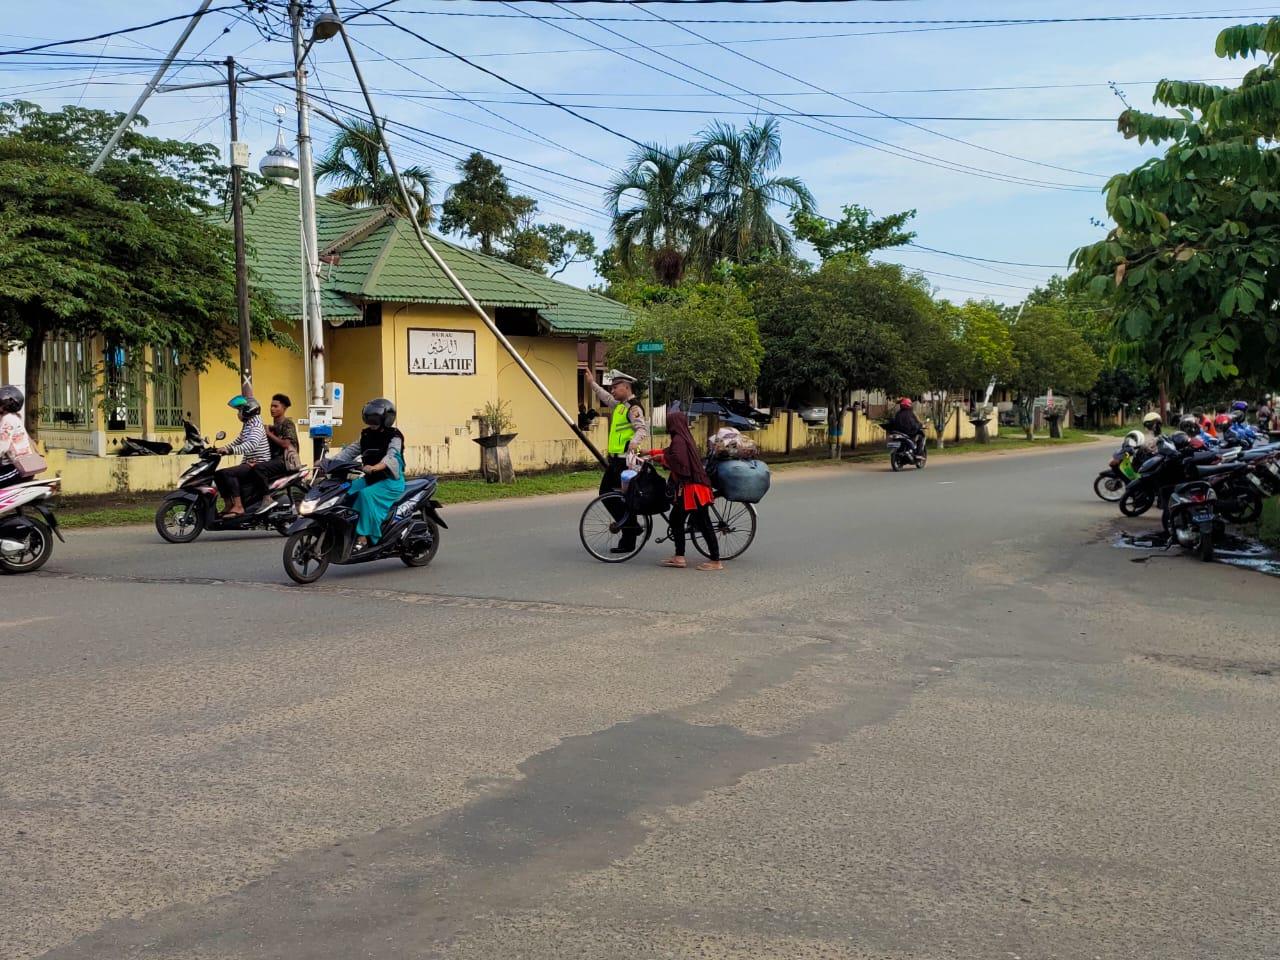 Anggota Sat Lantas Bantu Masyarakat Pengguna Sepeda Menyebrang Jalan